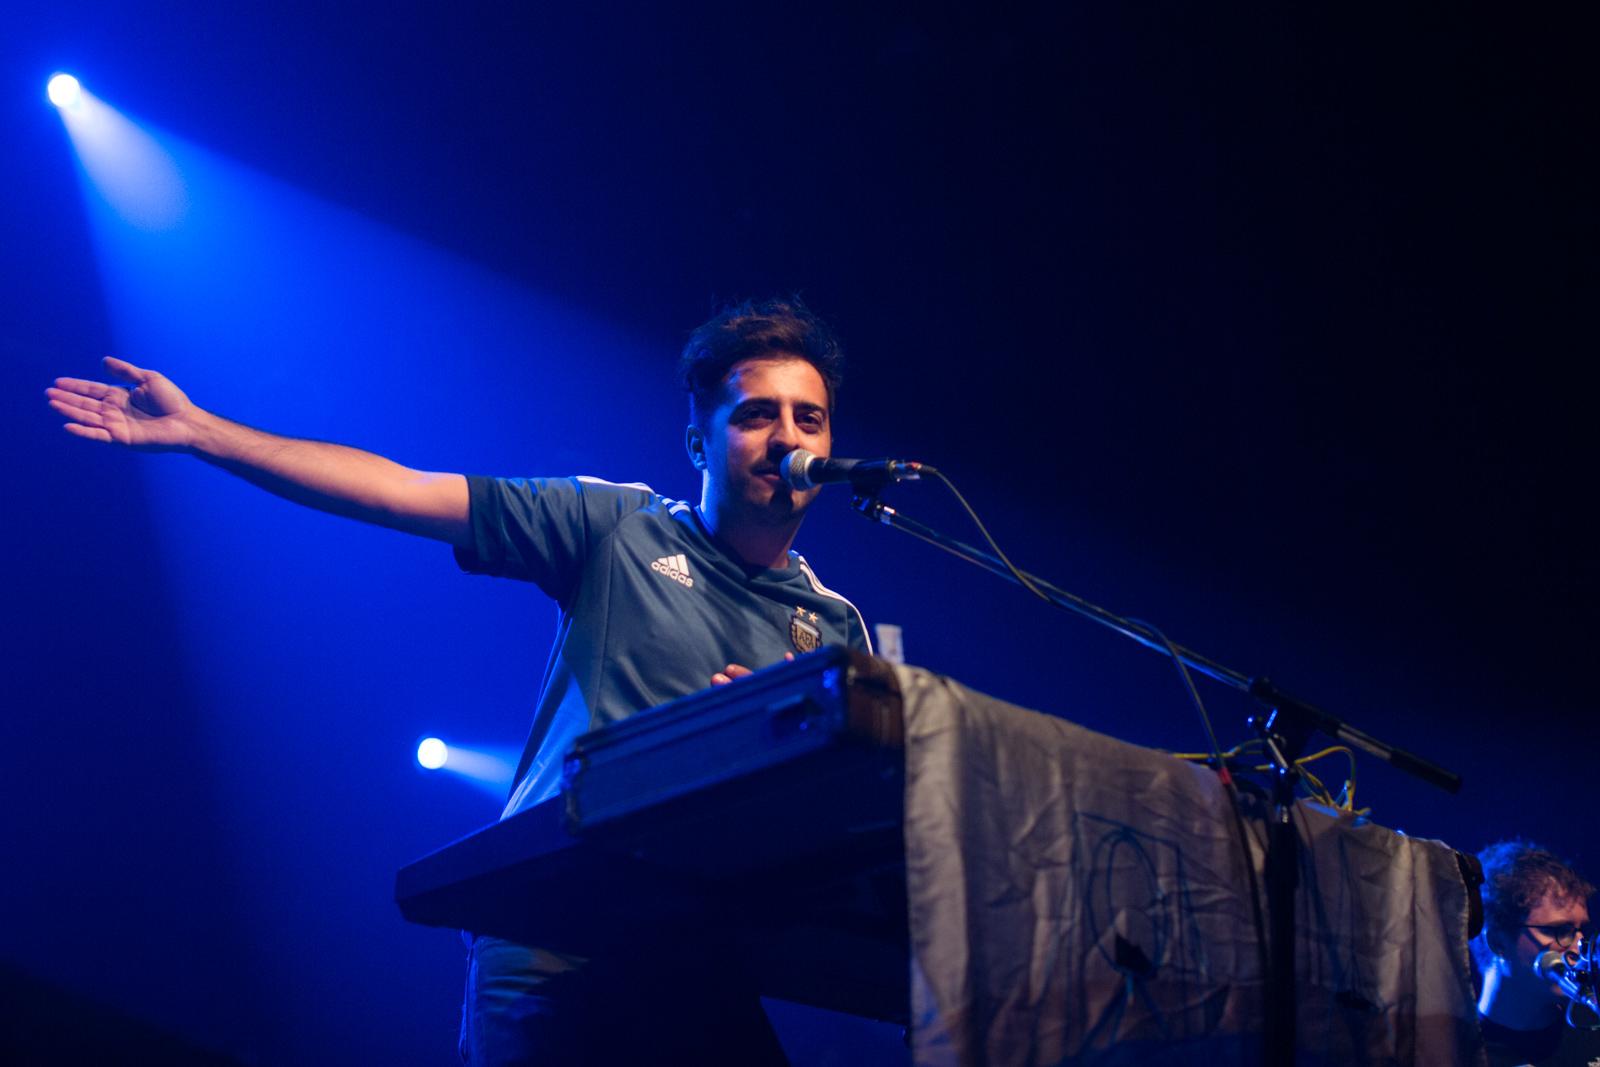 El-Guincho-Niceto-10-Agosto-2016-Pablo-Mekler-Indie-Hoy-07